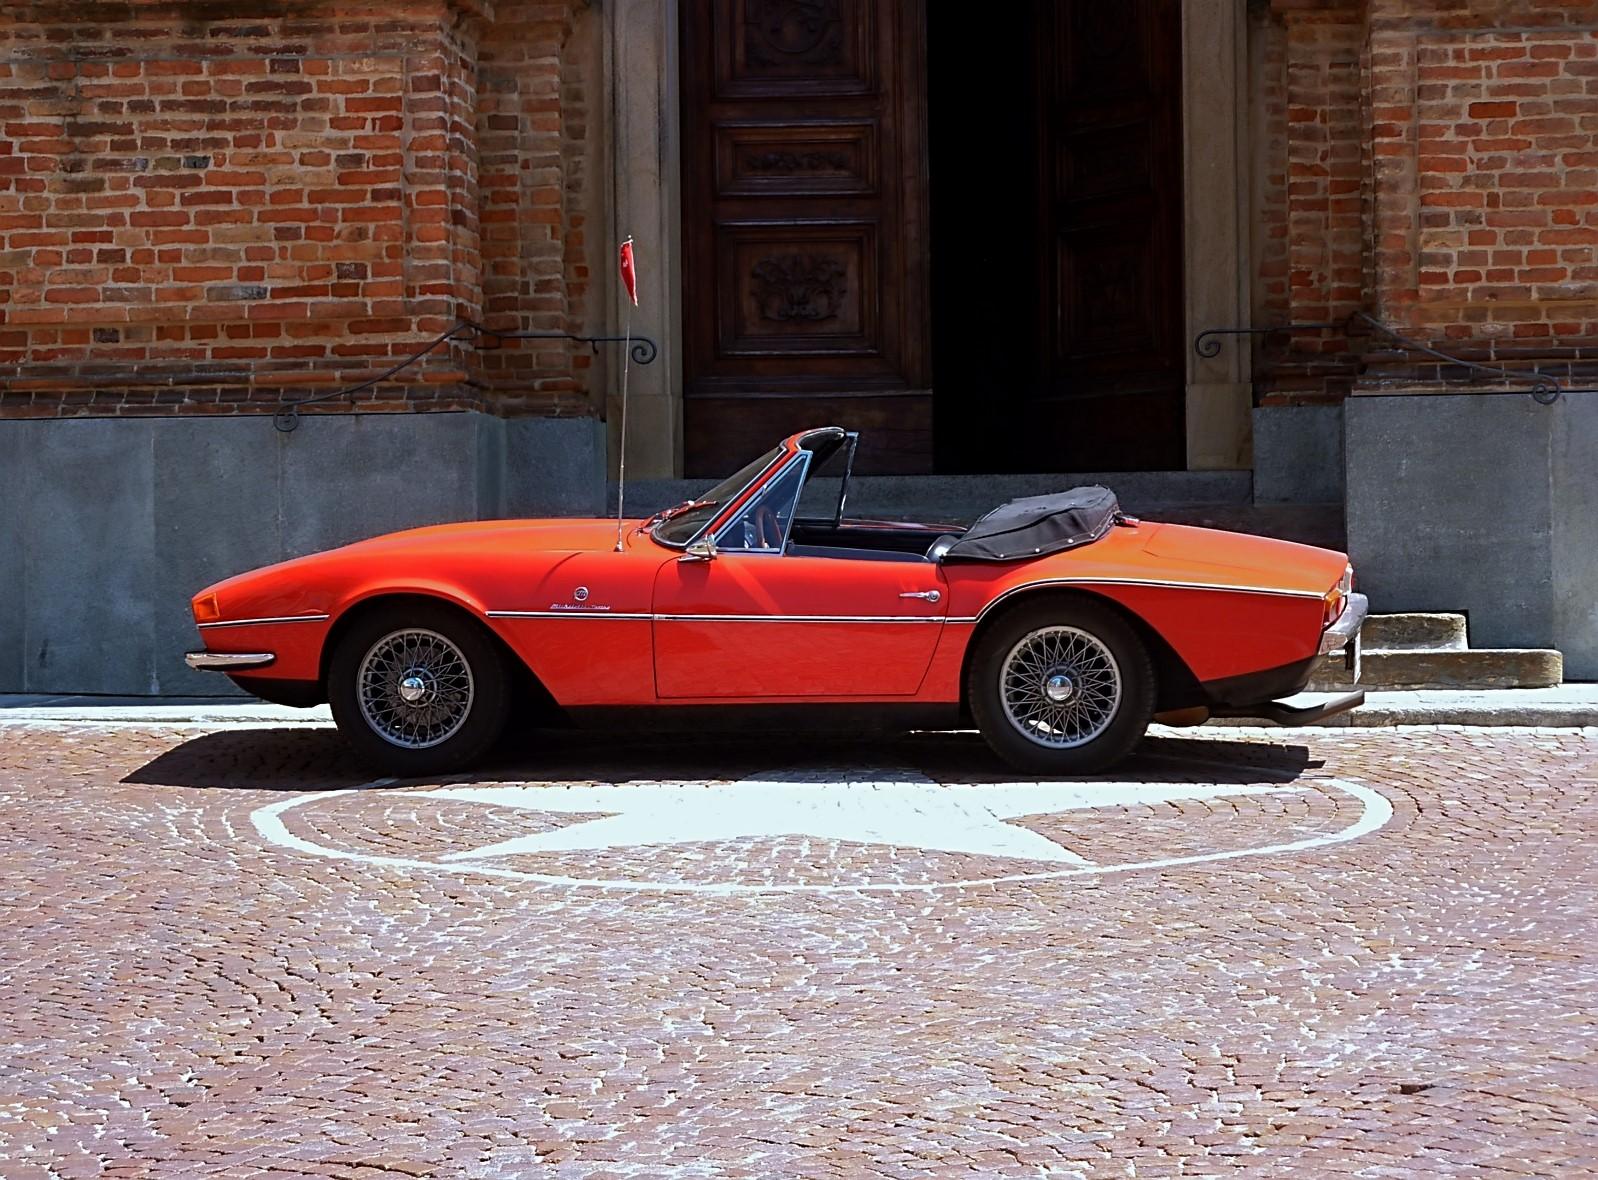 1968 Michelotti TR5 Ginevra Prototype (50)